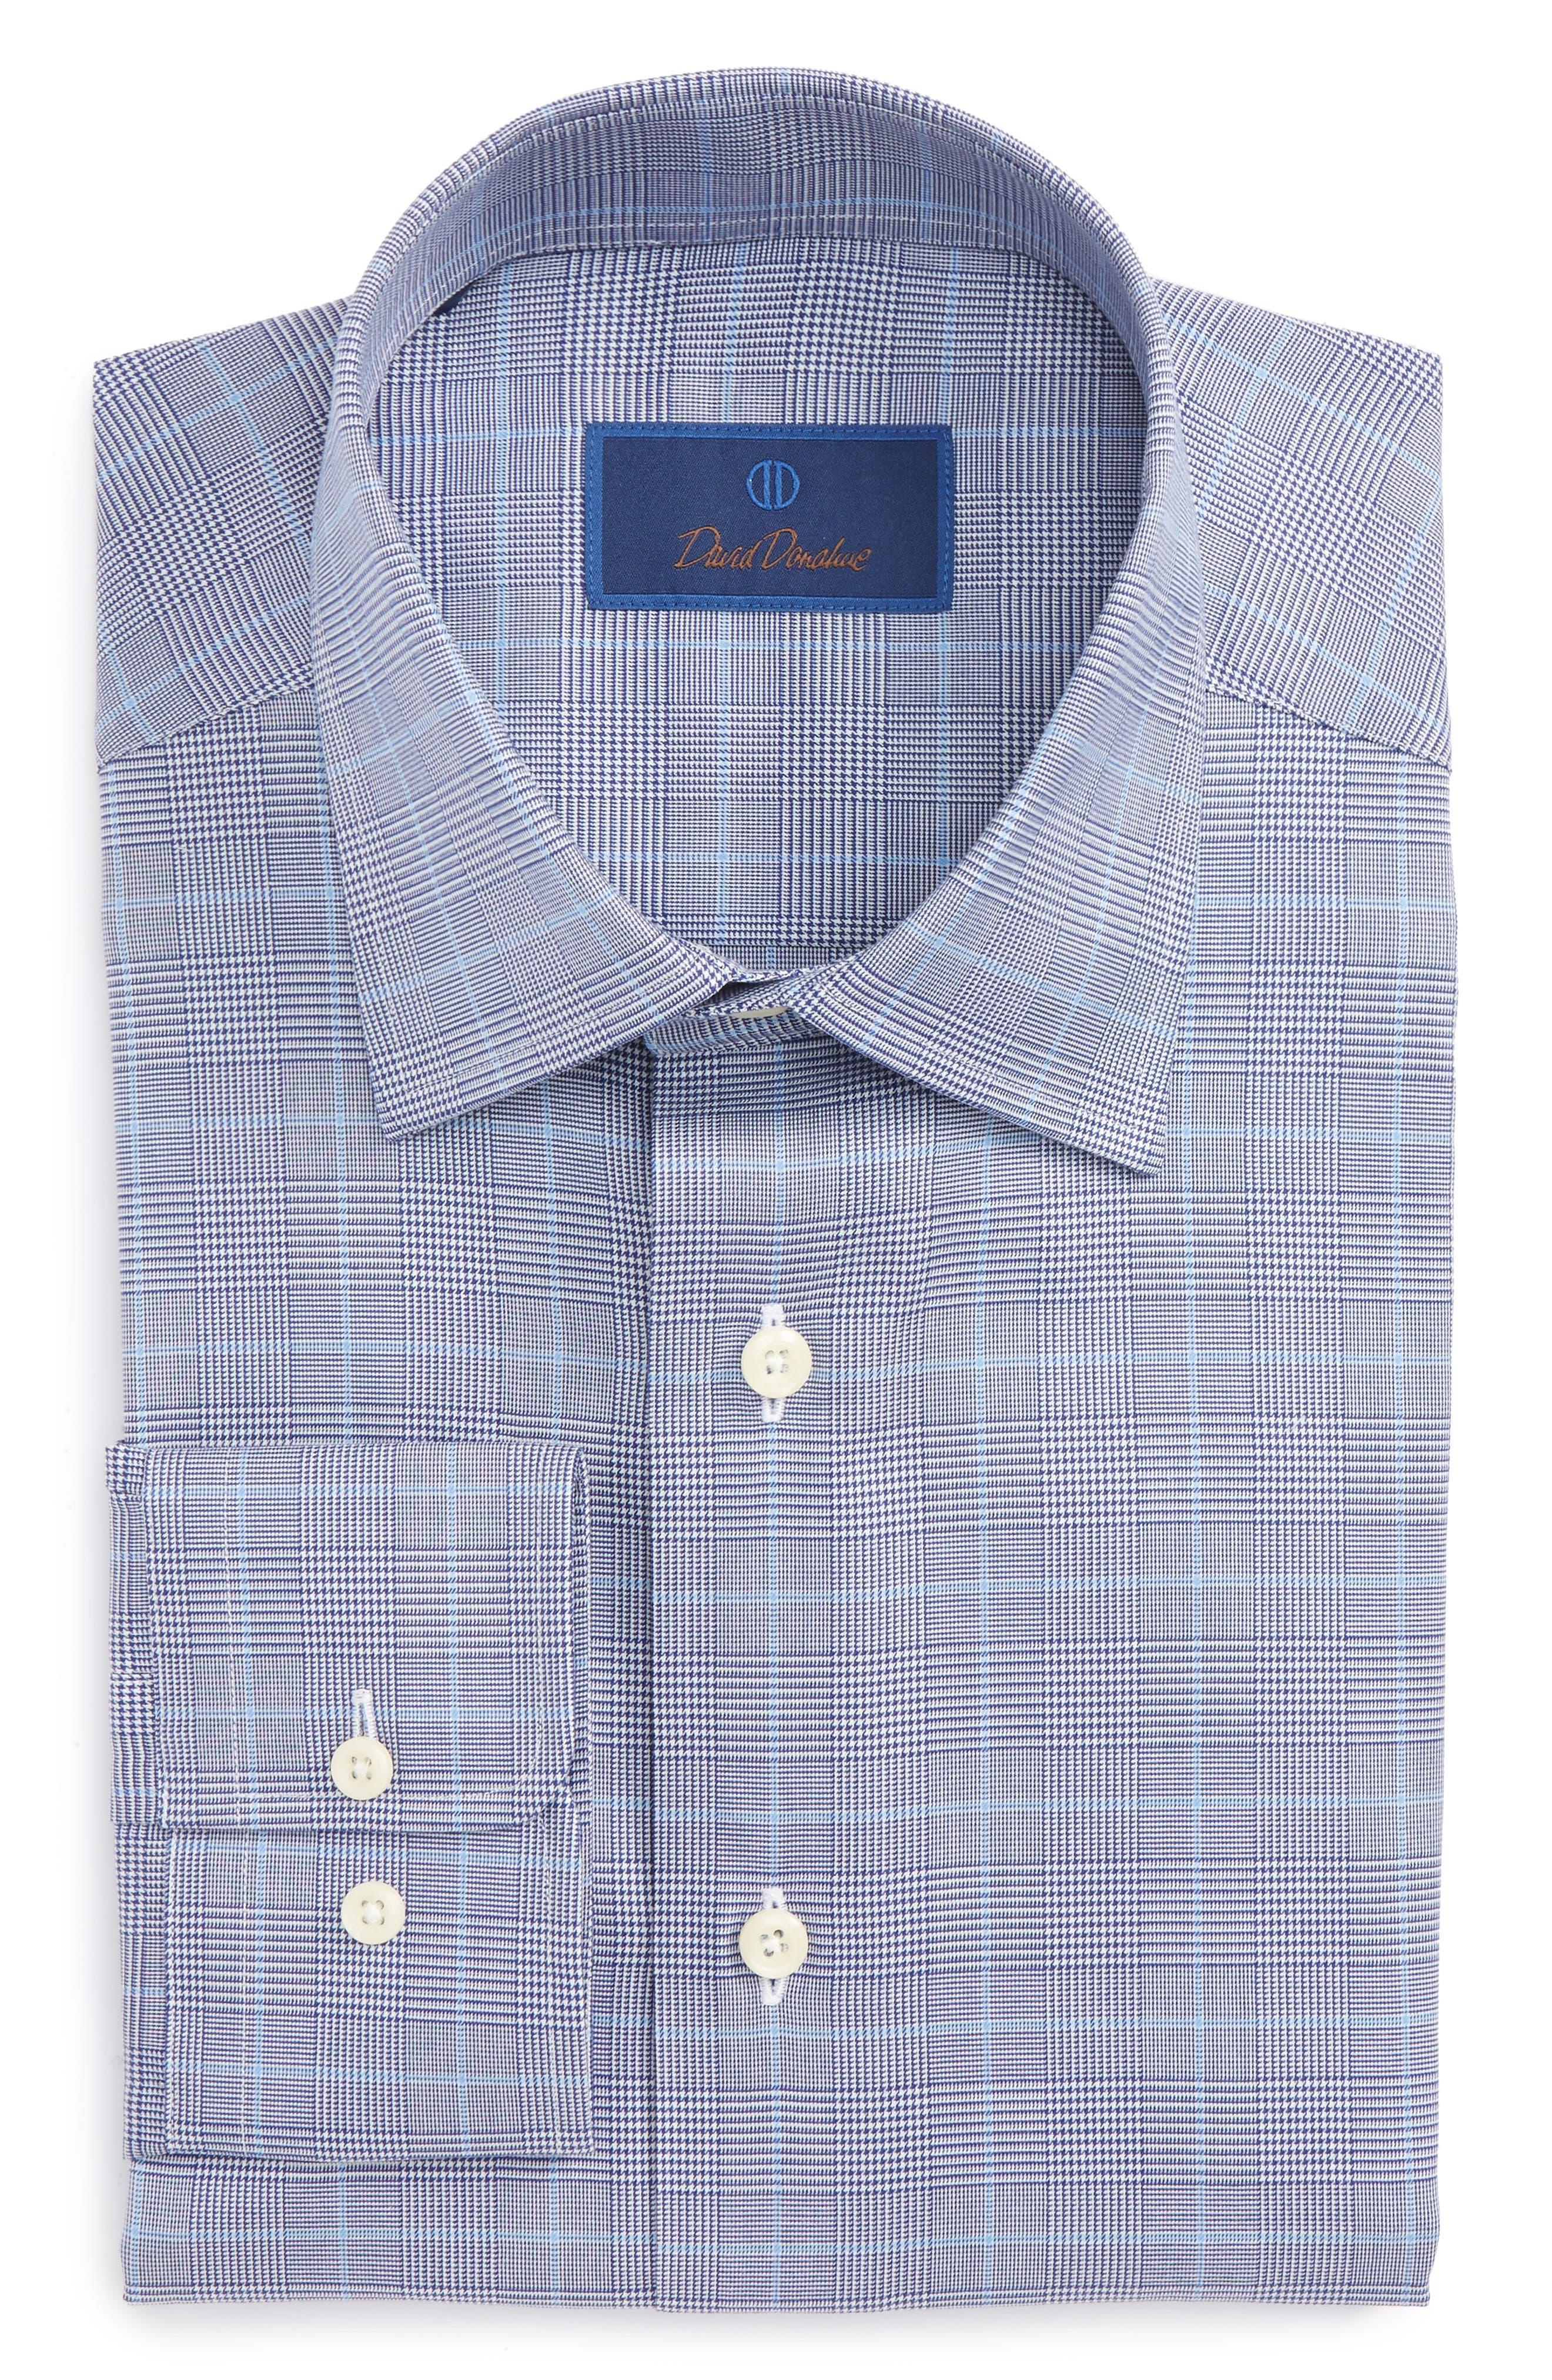 Regular Fit Plaid Dress Shirt,                         Main,                         color, 412